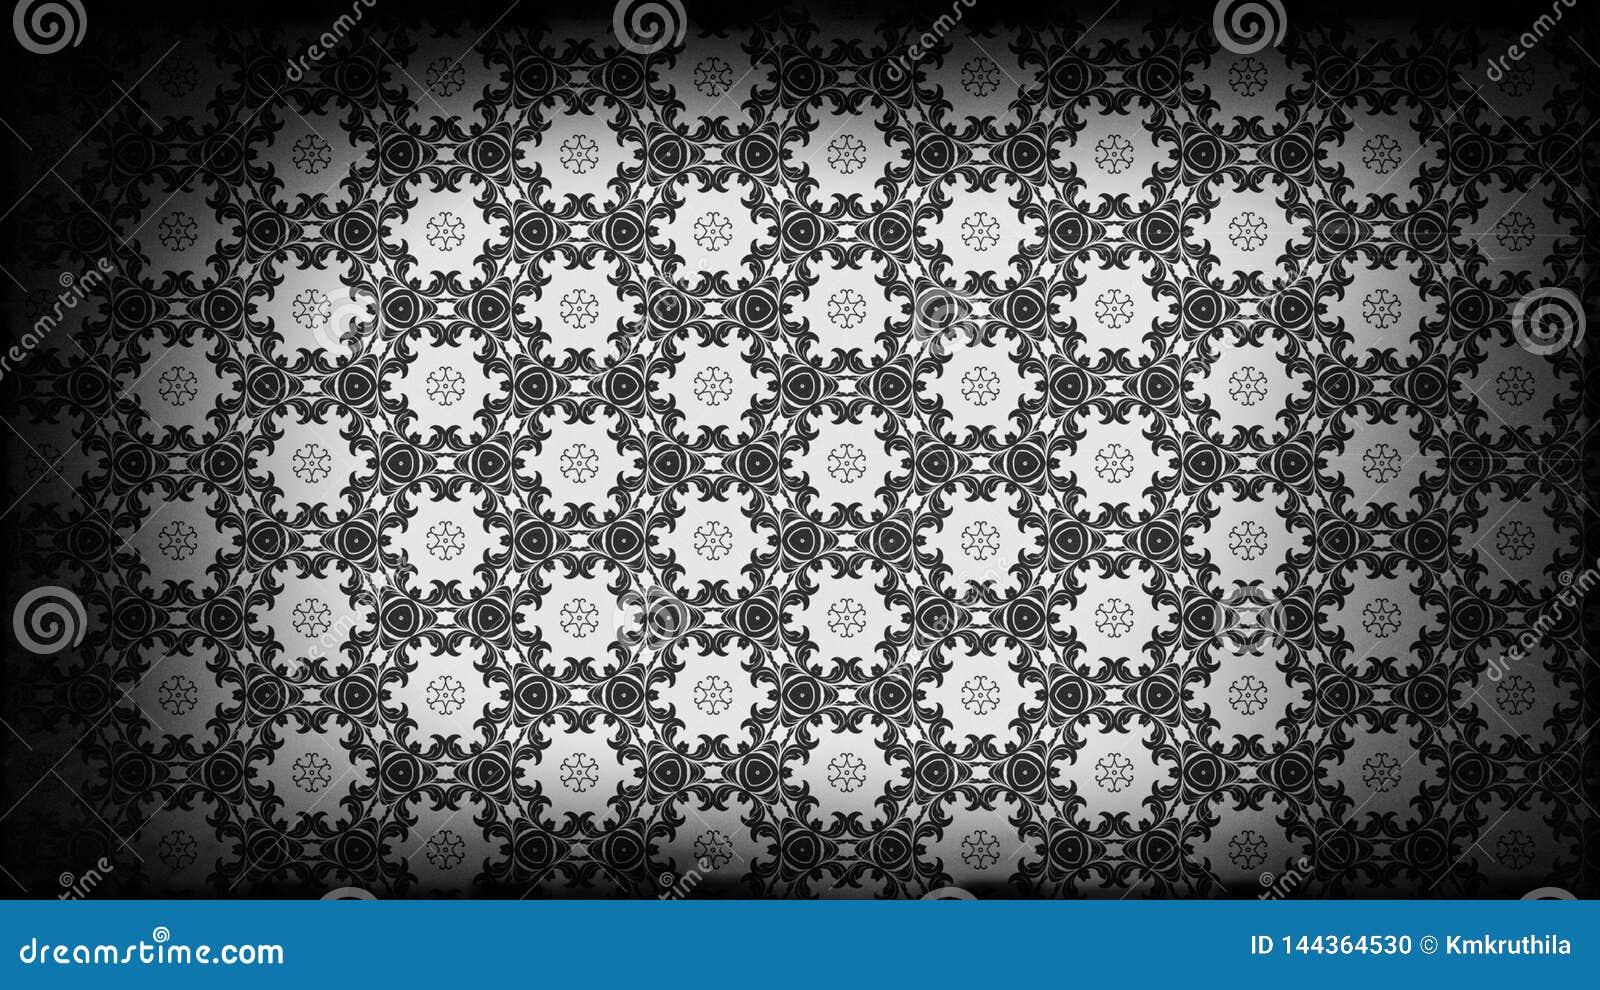 Black And Gray Vintage Decorative Floral Pattern Wallpaper Design